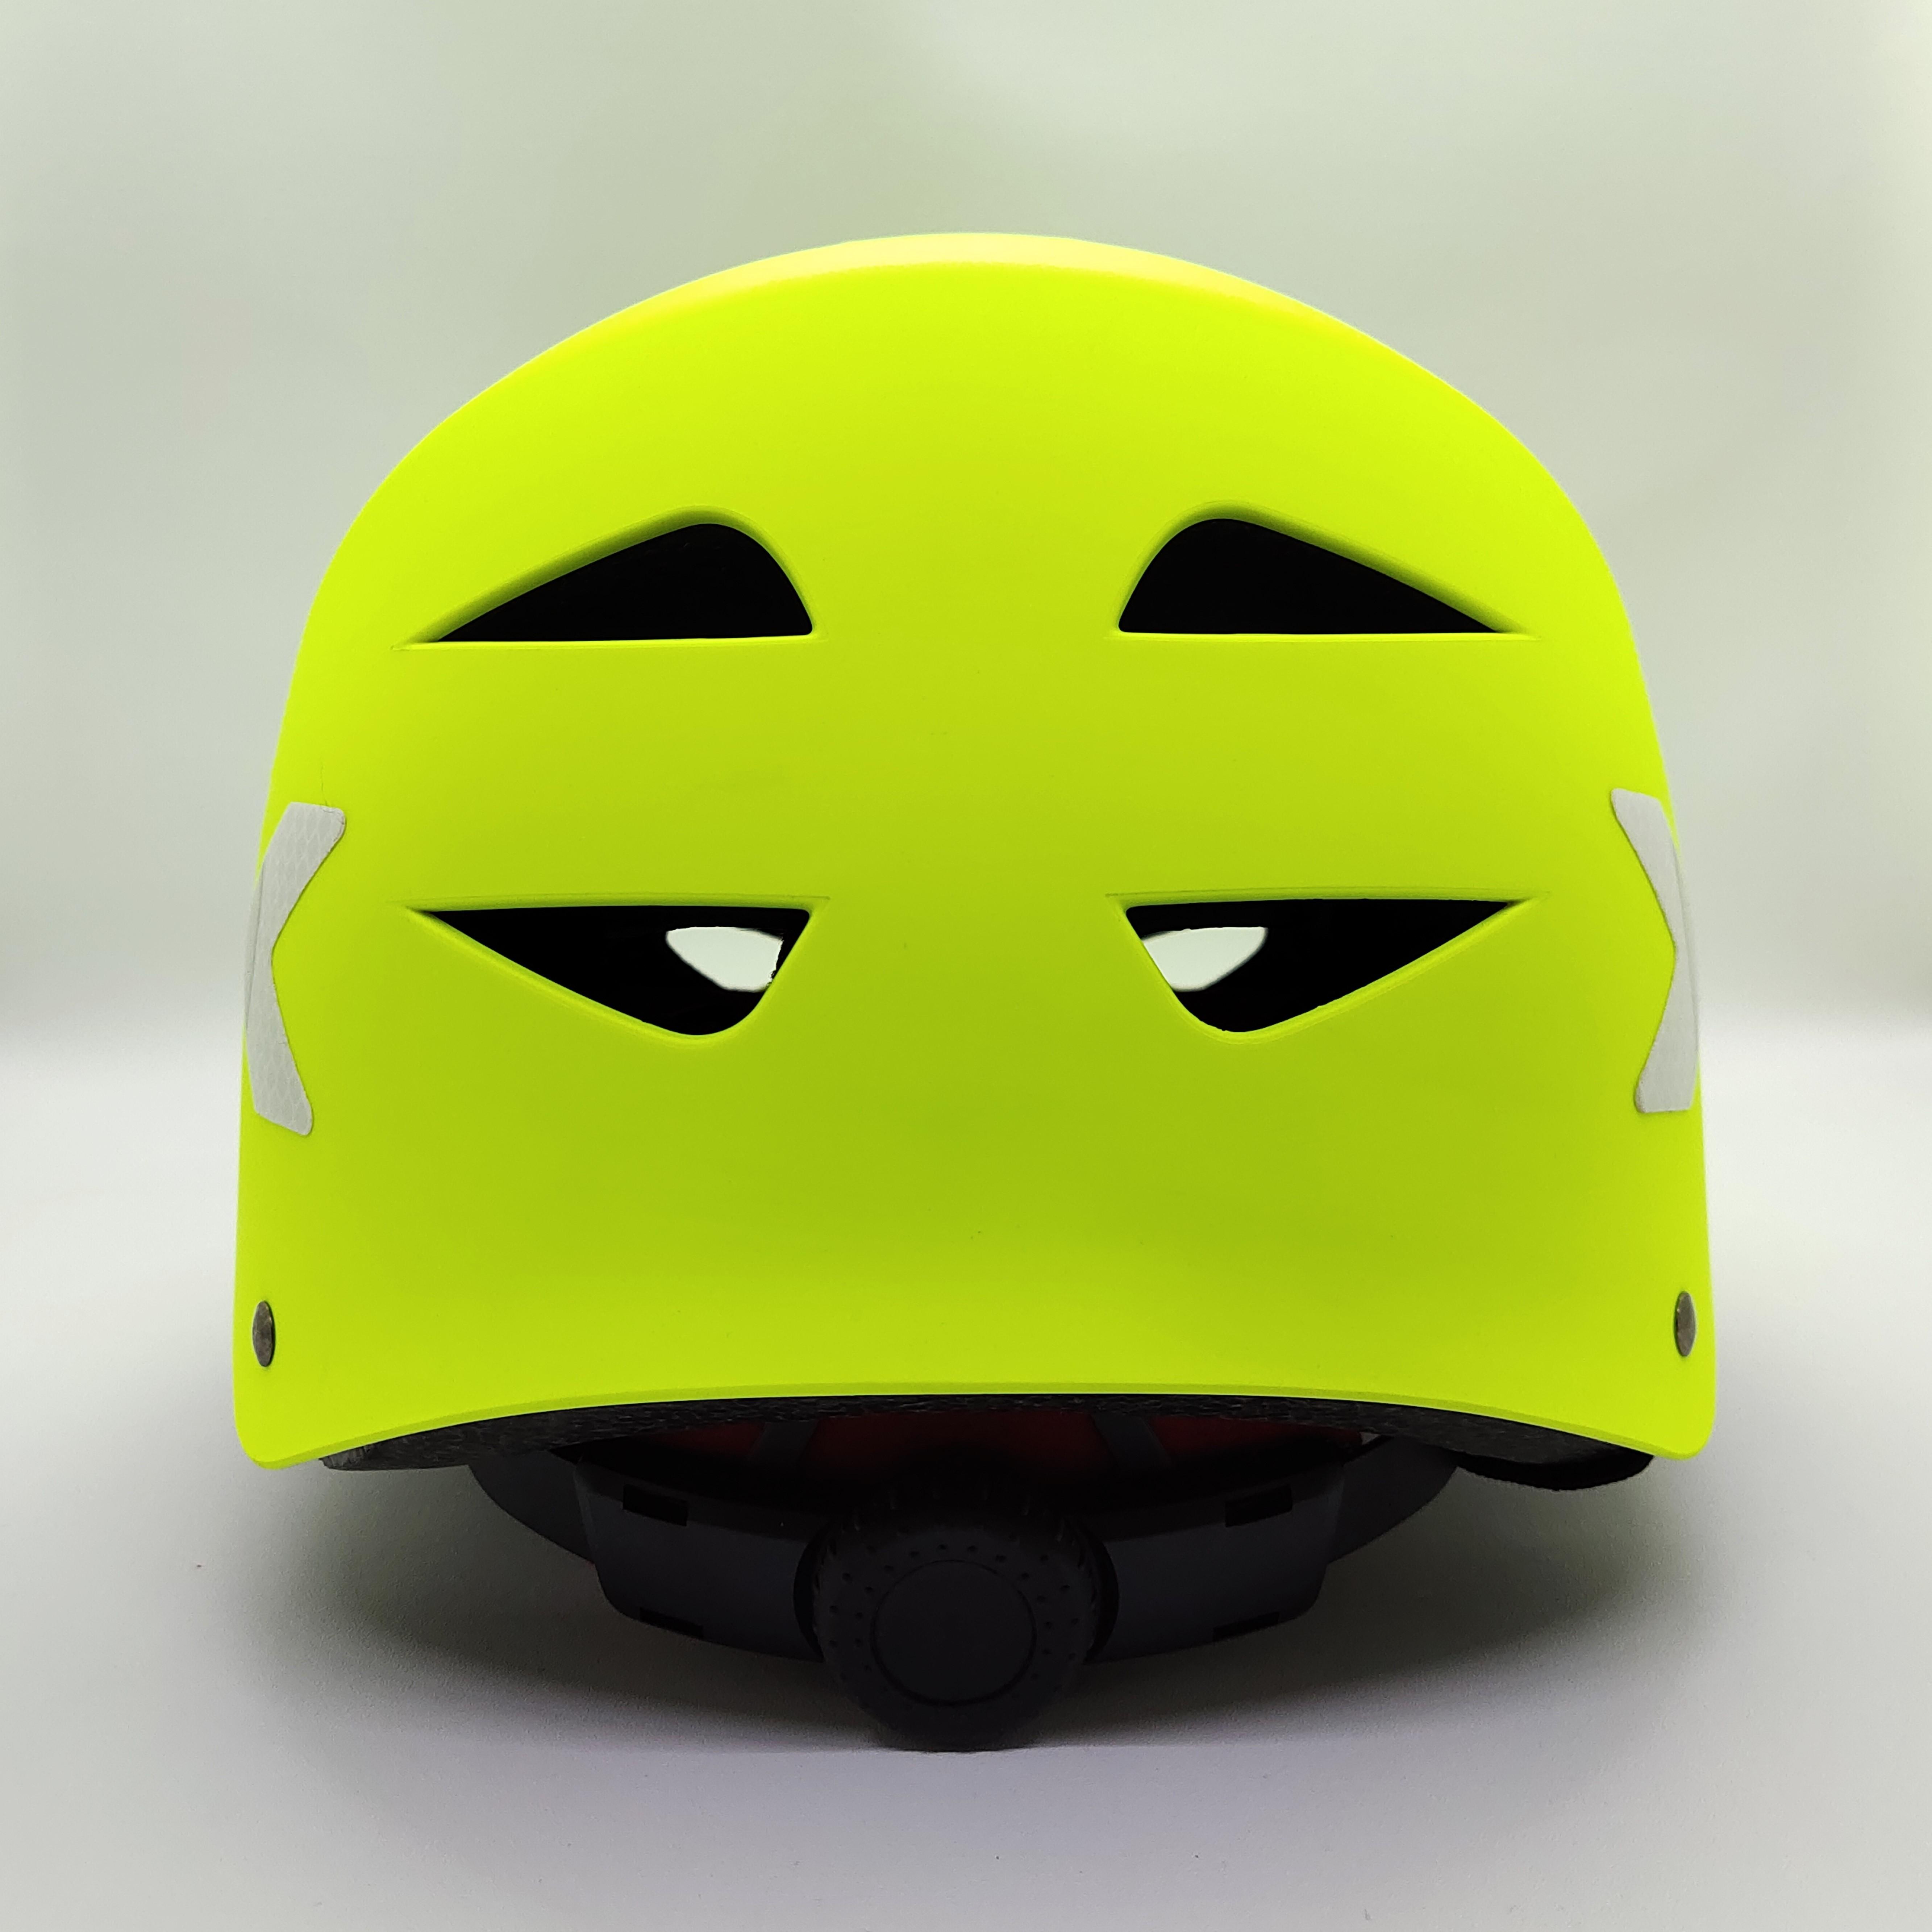 IMG 20200511 115101 - Skutis Gear Helmet